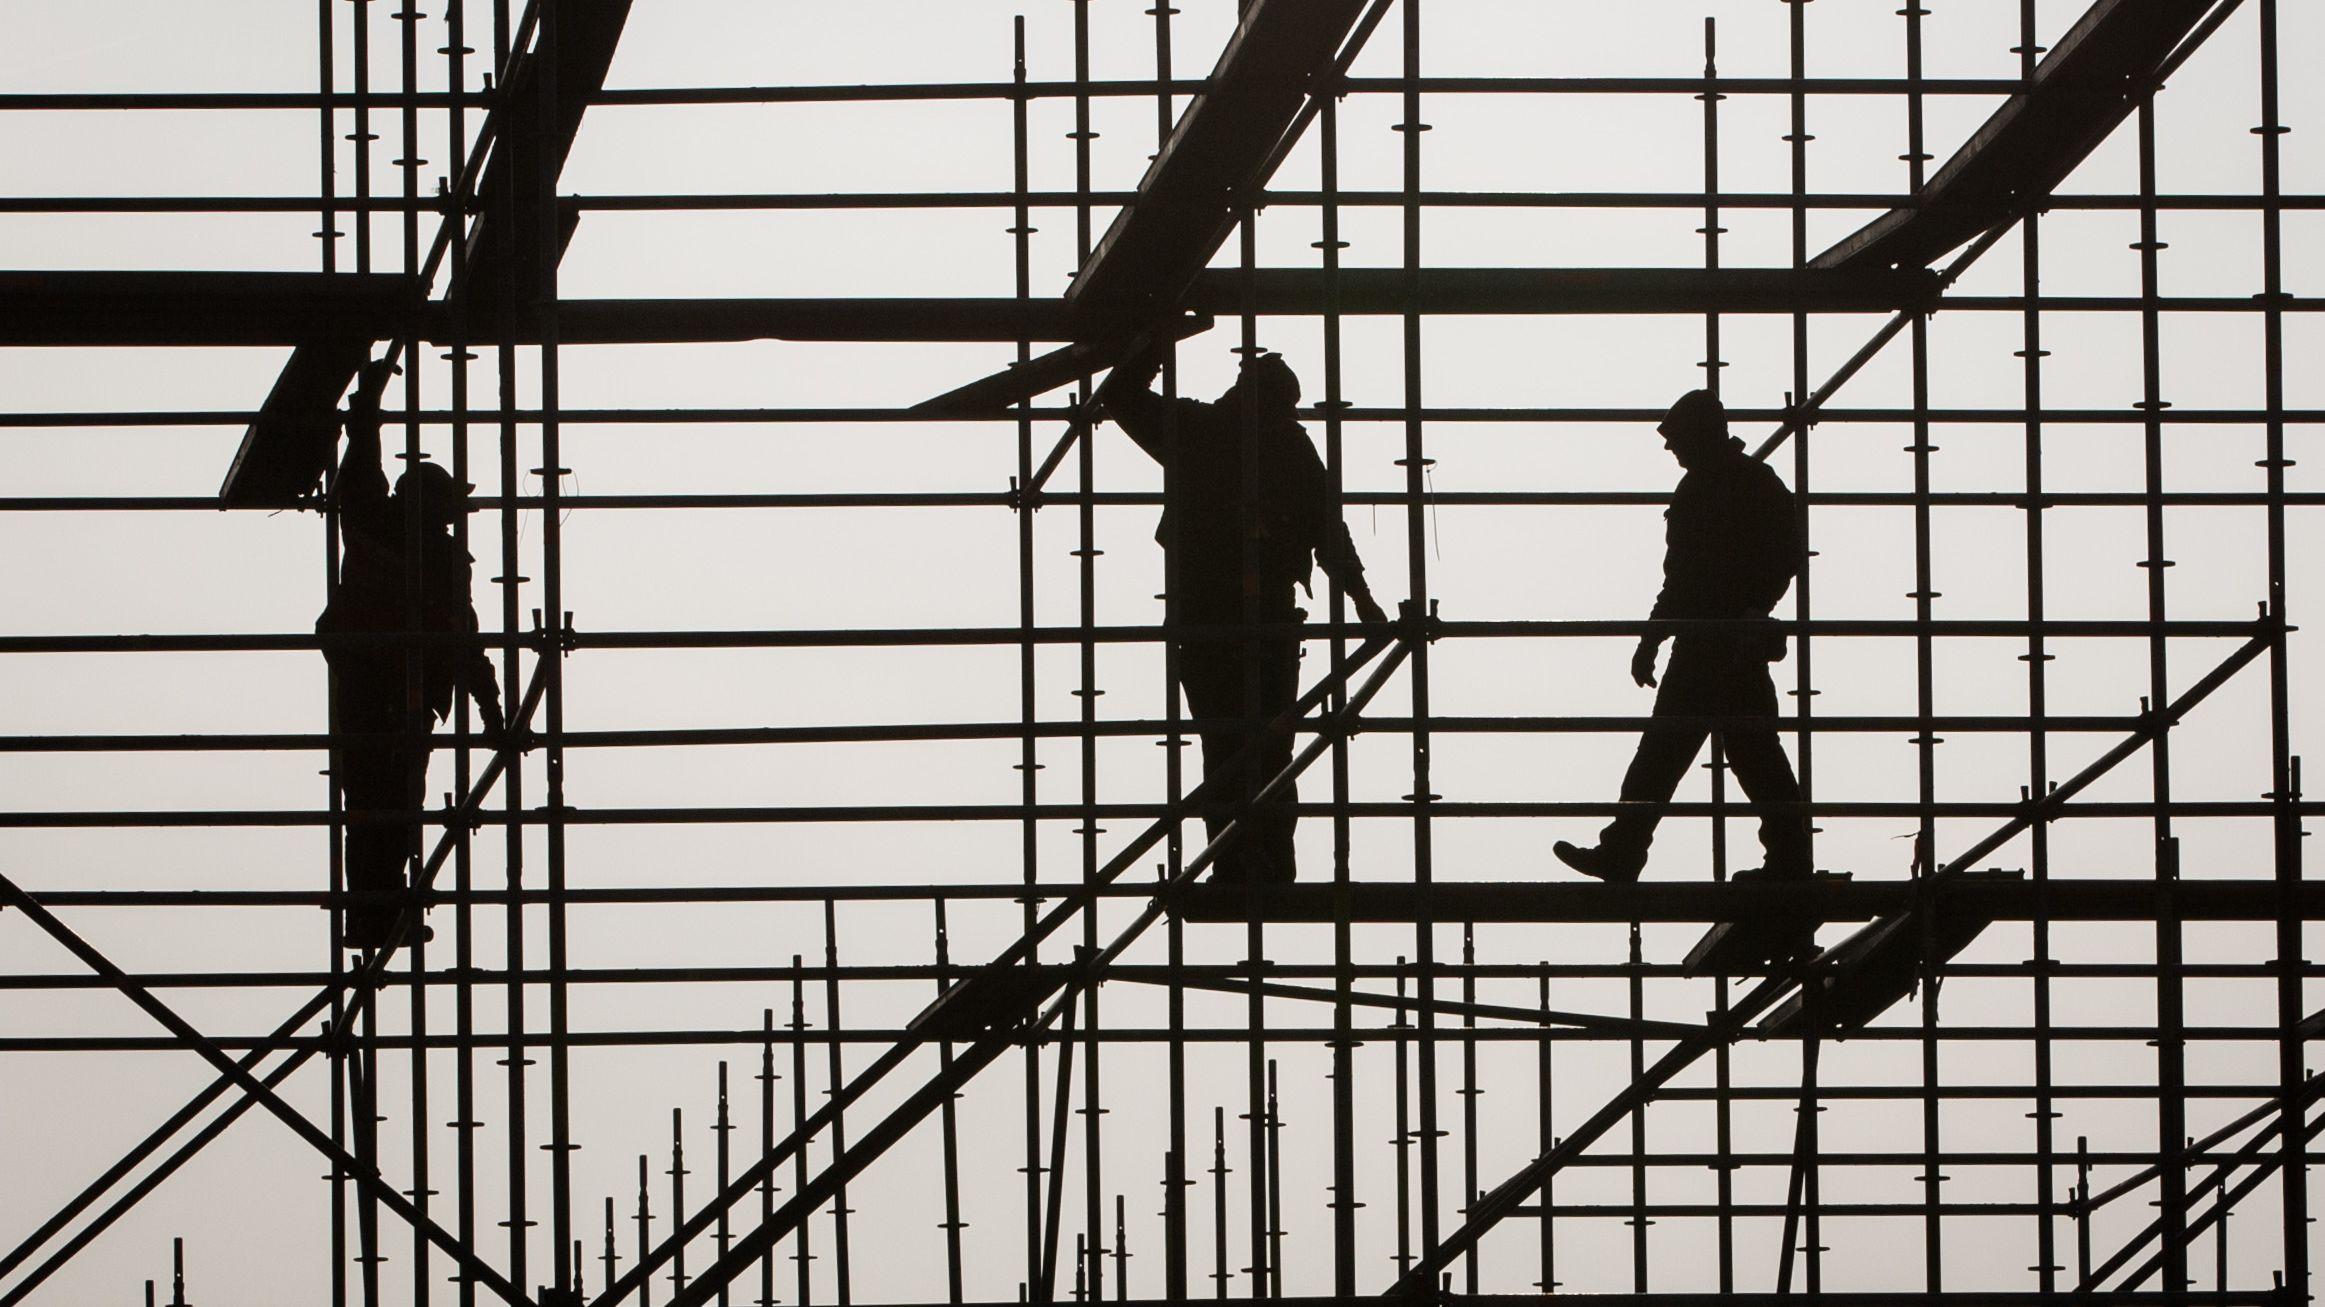 Arbeit auf dem Bau